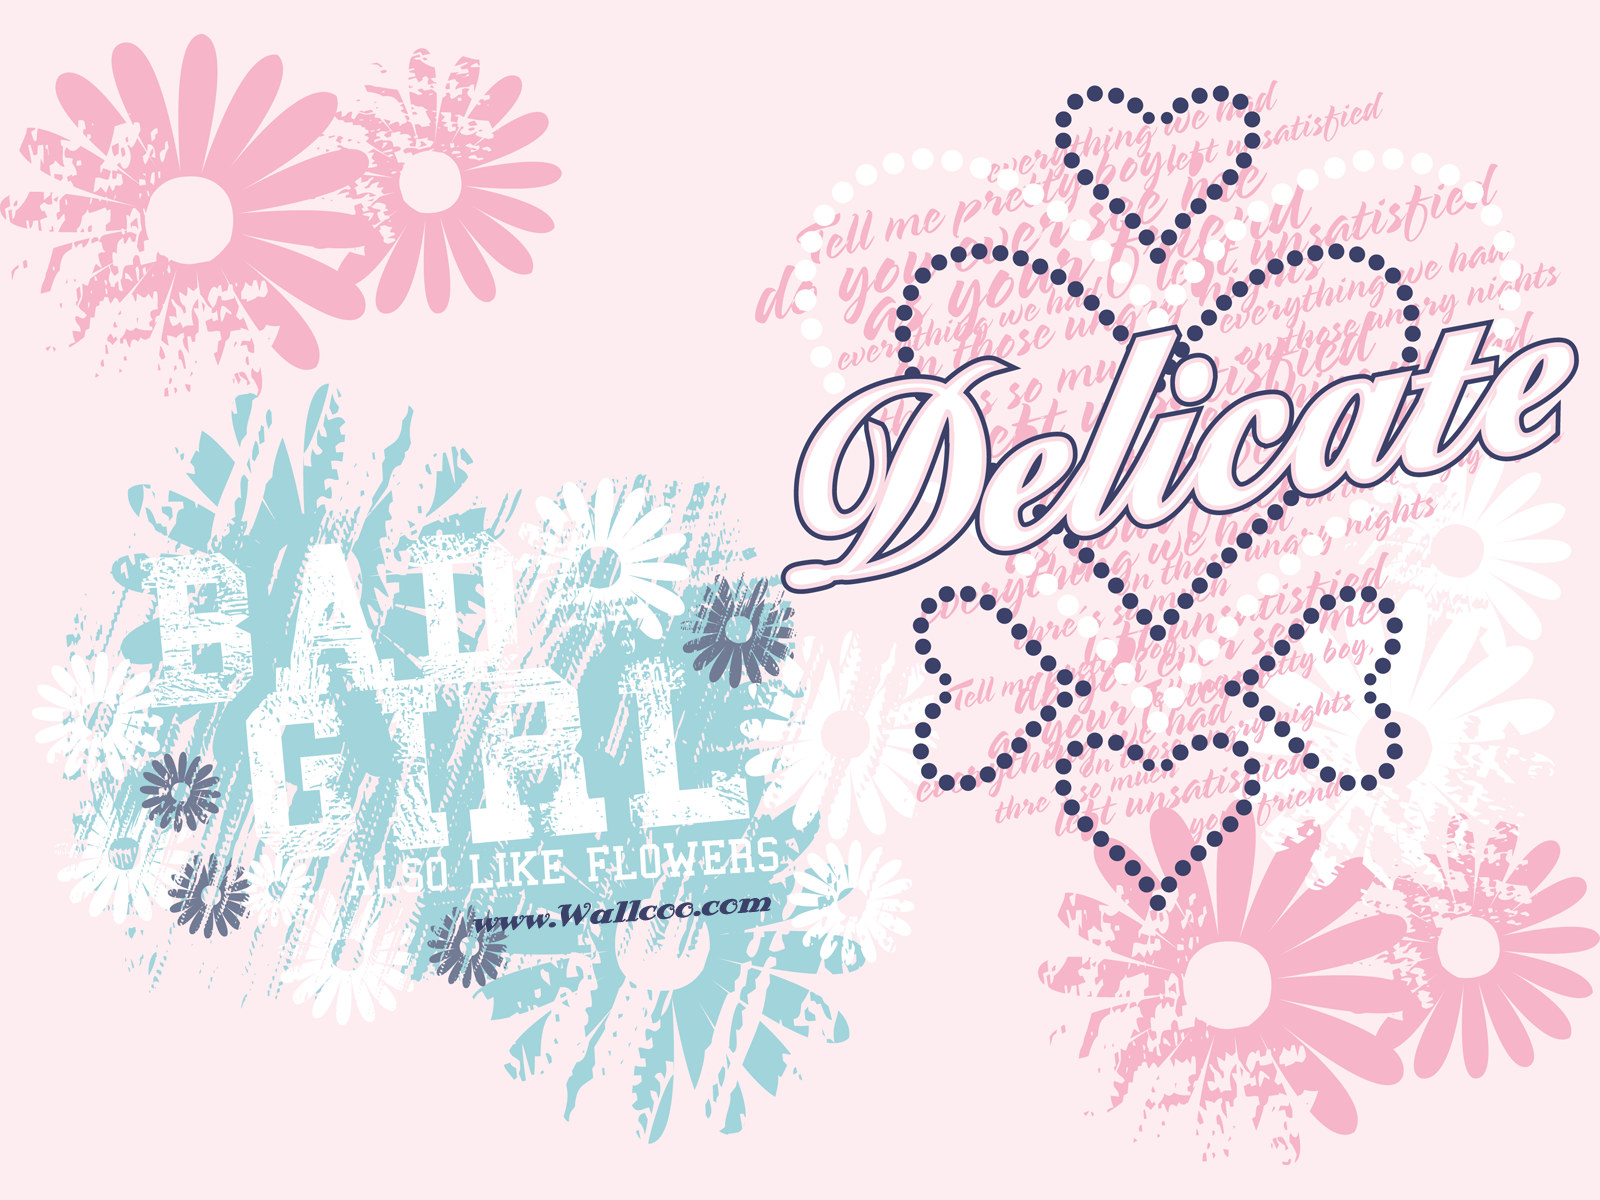 Shirt design in girl - Gtx Fashion Teen Girls T Shirt Design Summer T Shirt Design